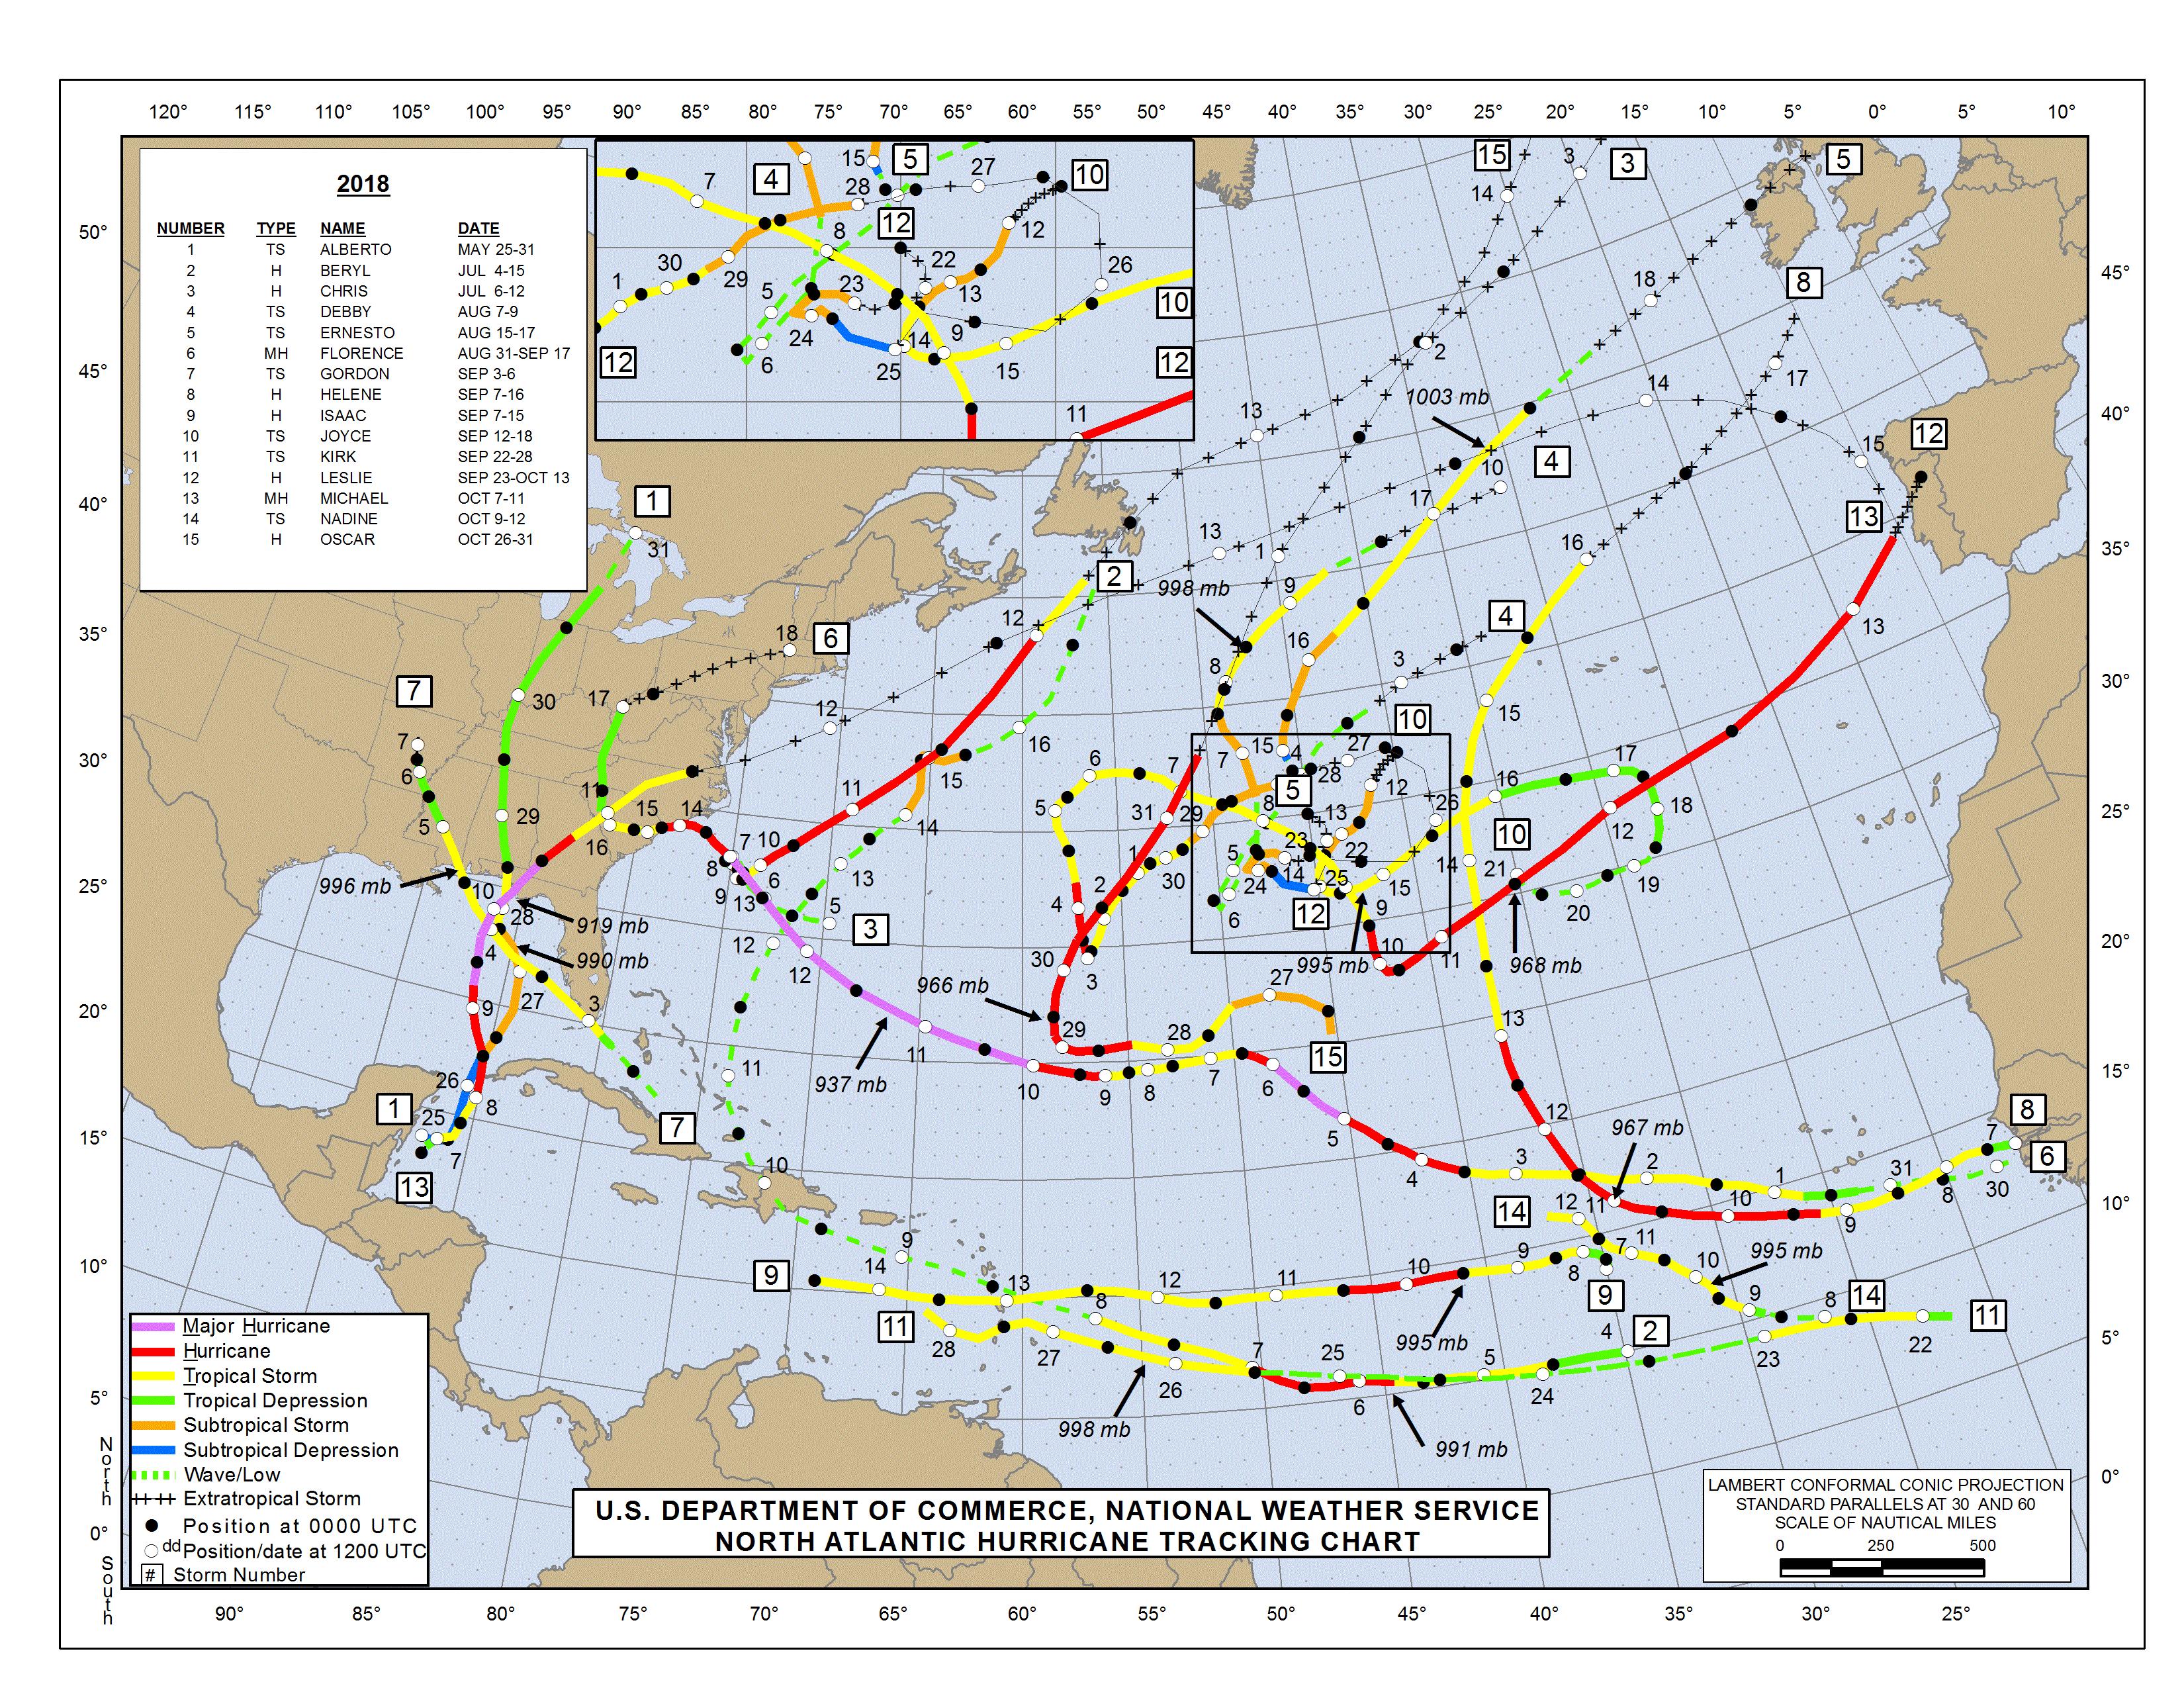 https://www.aoml.noaa.gov/hrd/hurdat/tracks-at-2018.png